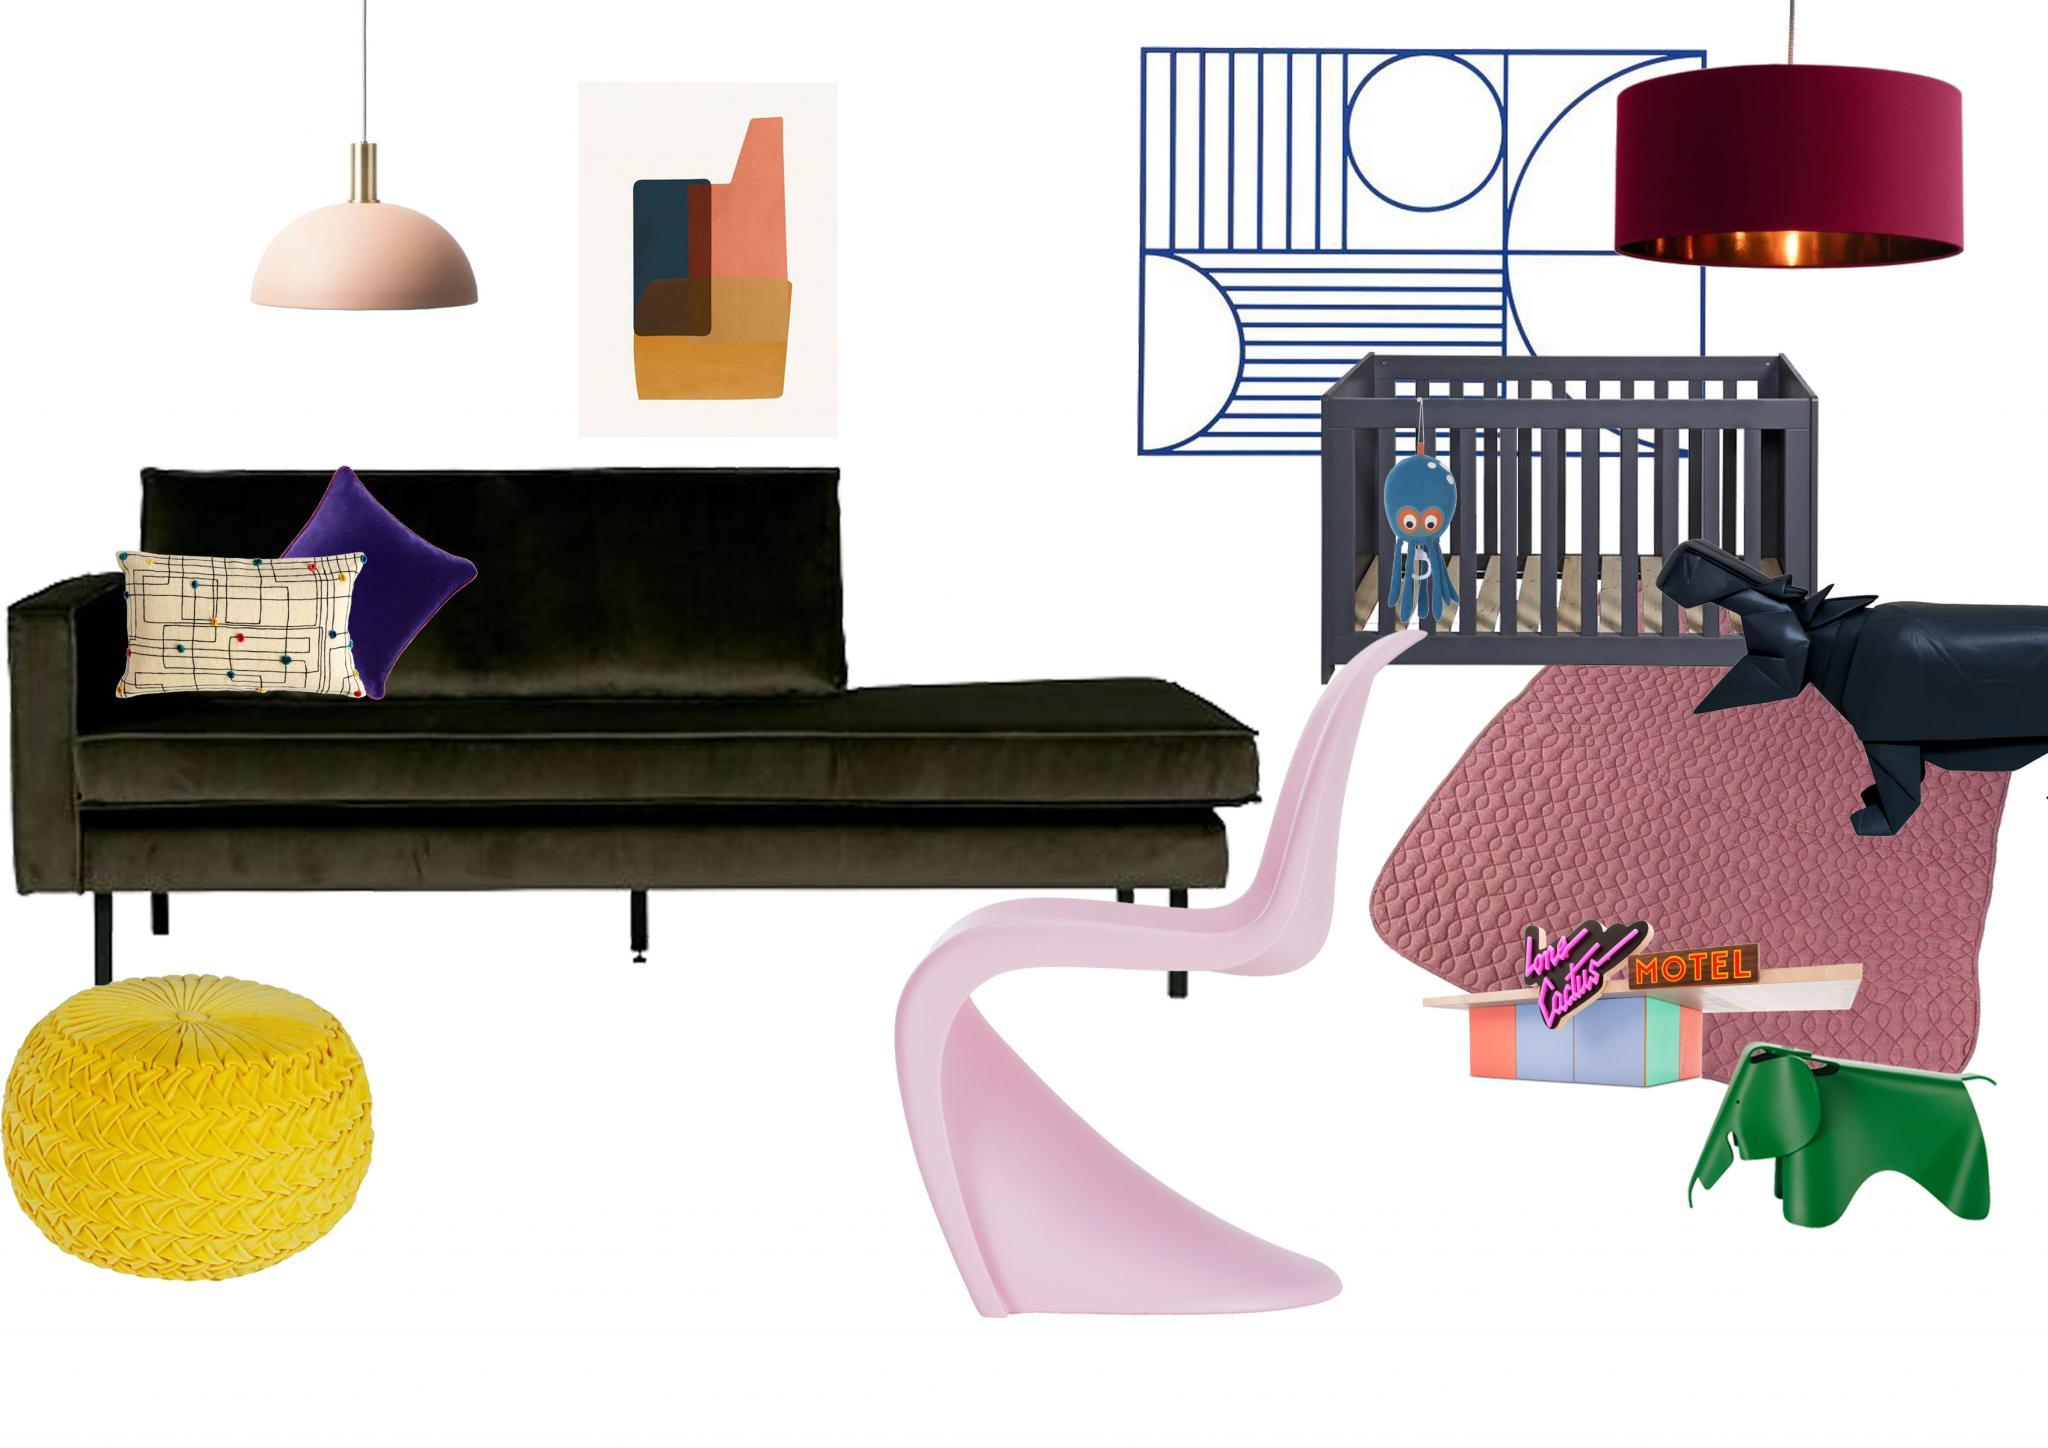 Kinderzimmer, colorful, furniture, nursery, Personal Issue